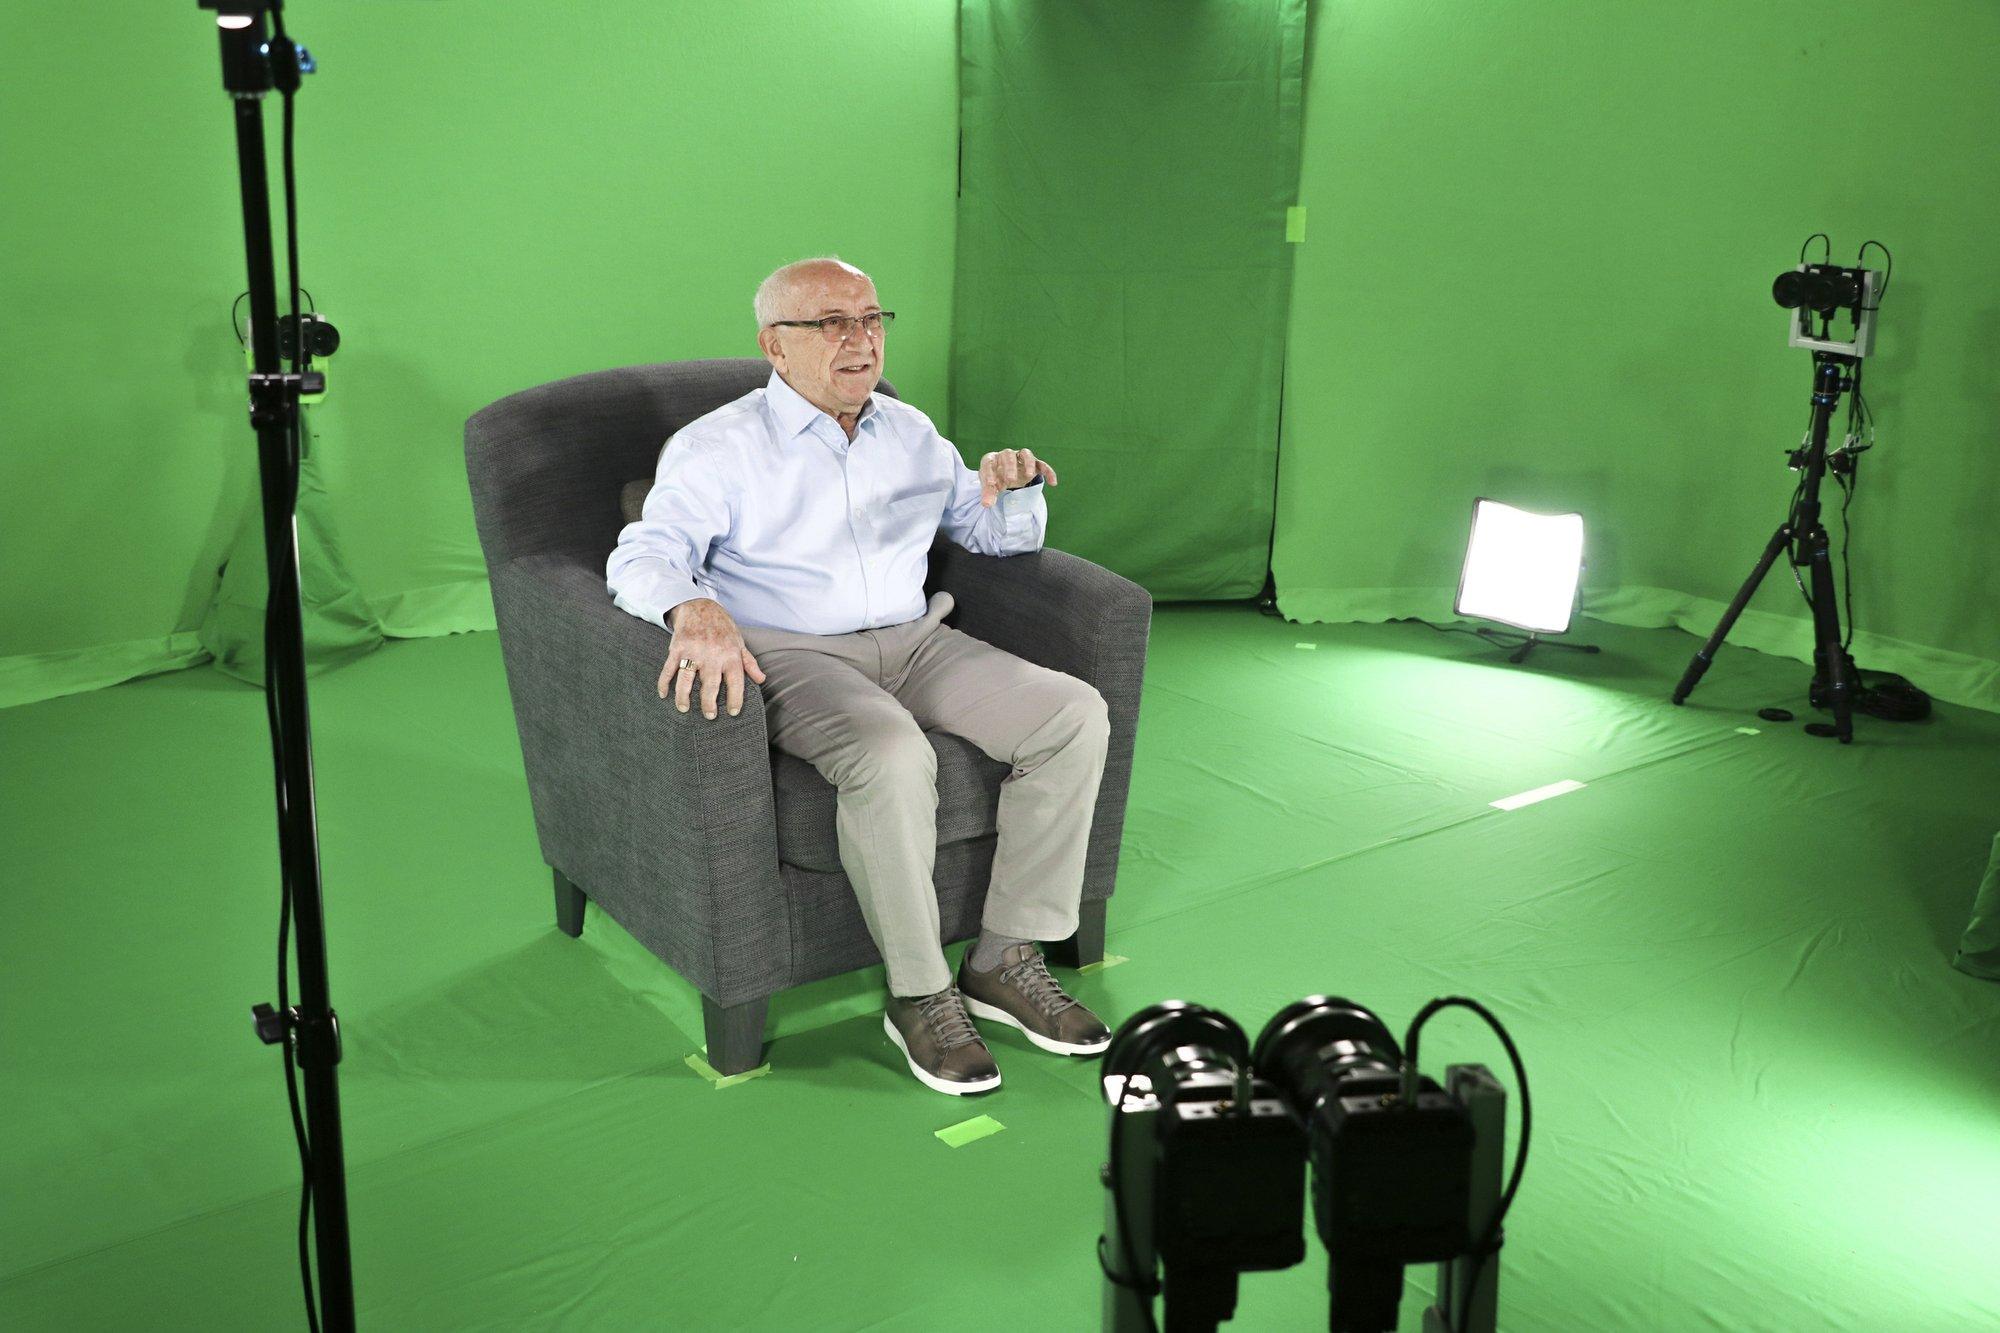 apnews.com - Jamie Stengle - Technology brings images of Holocaust survivors to life